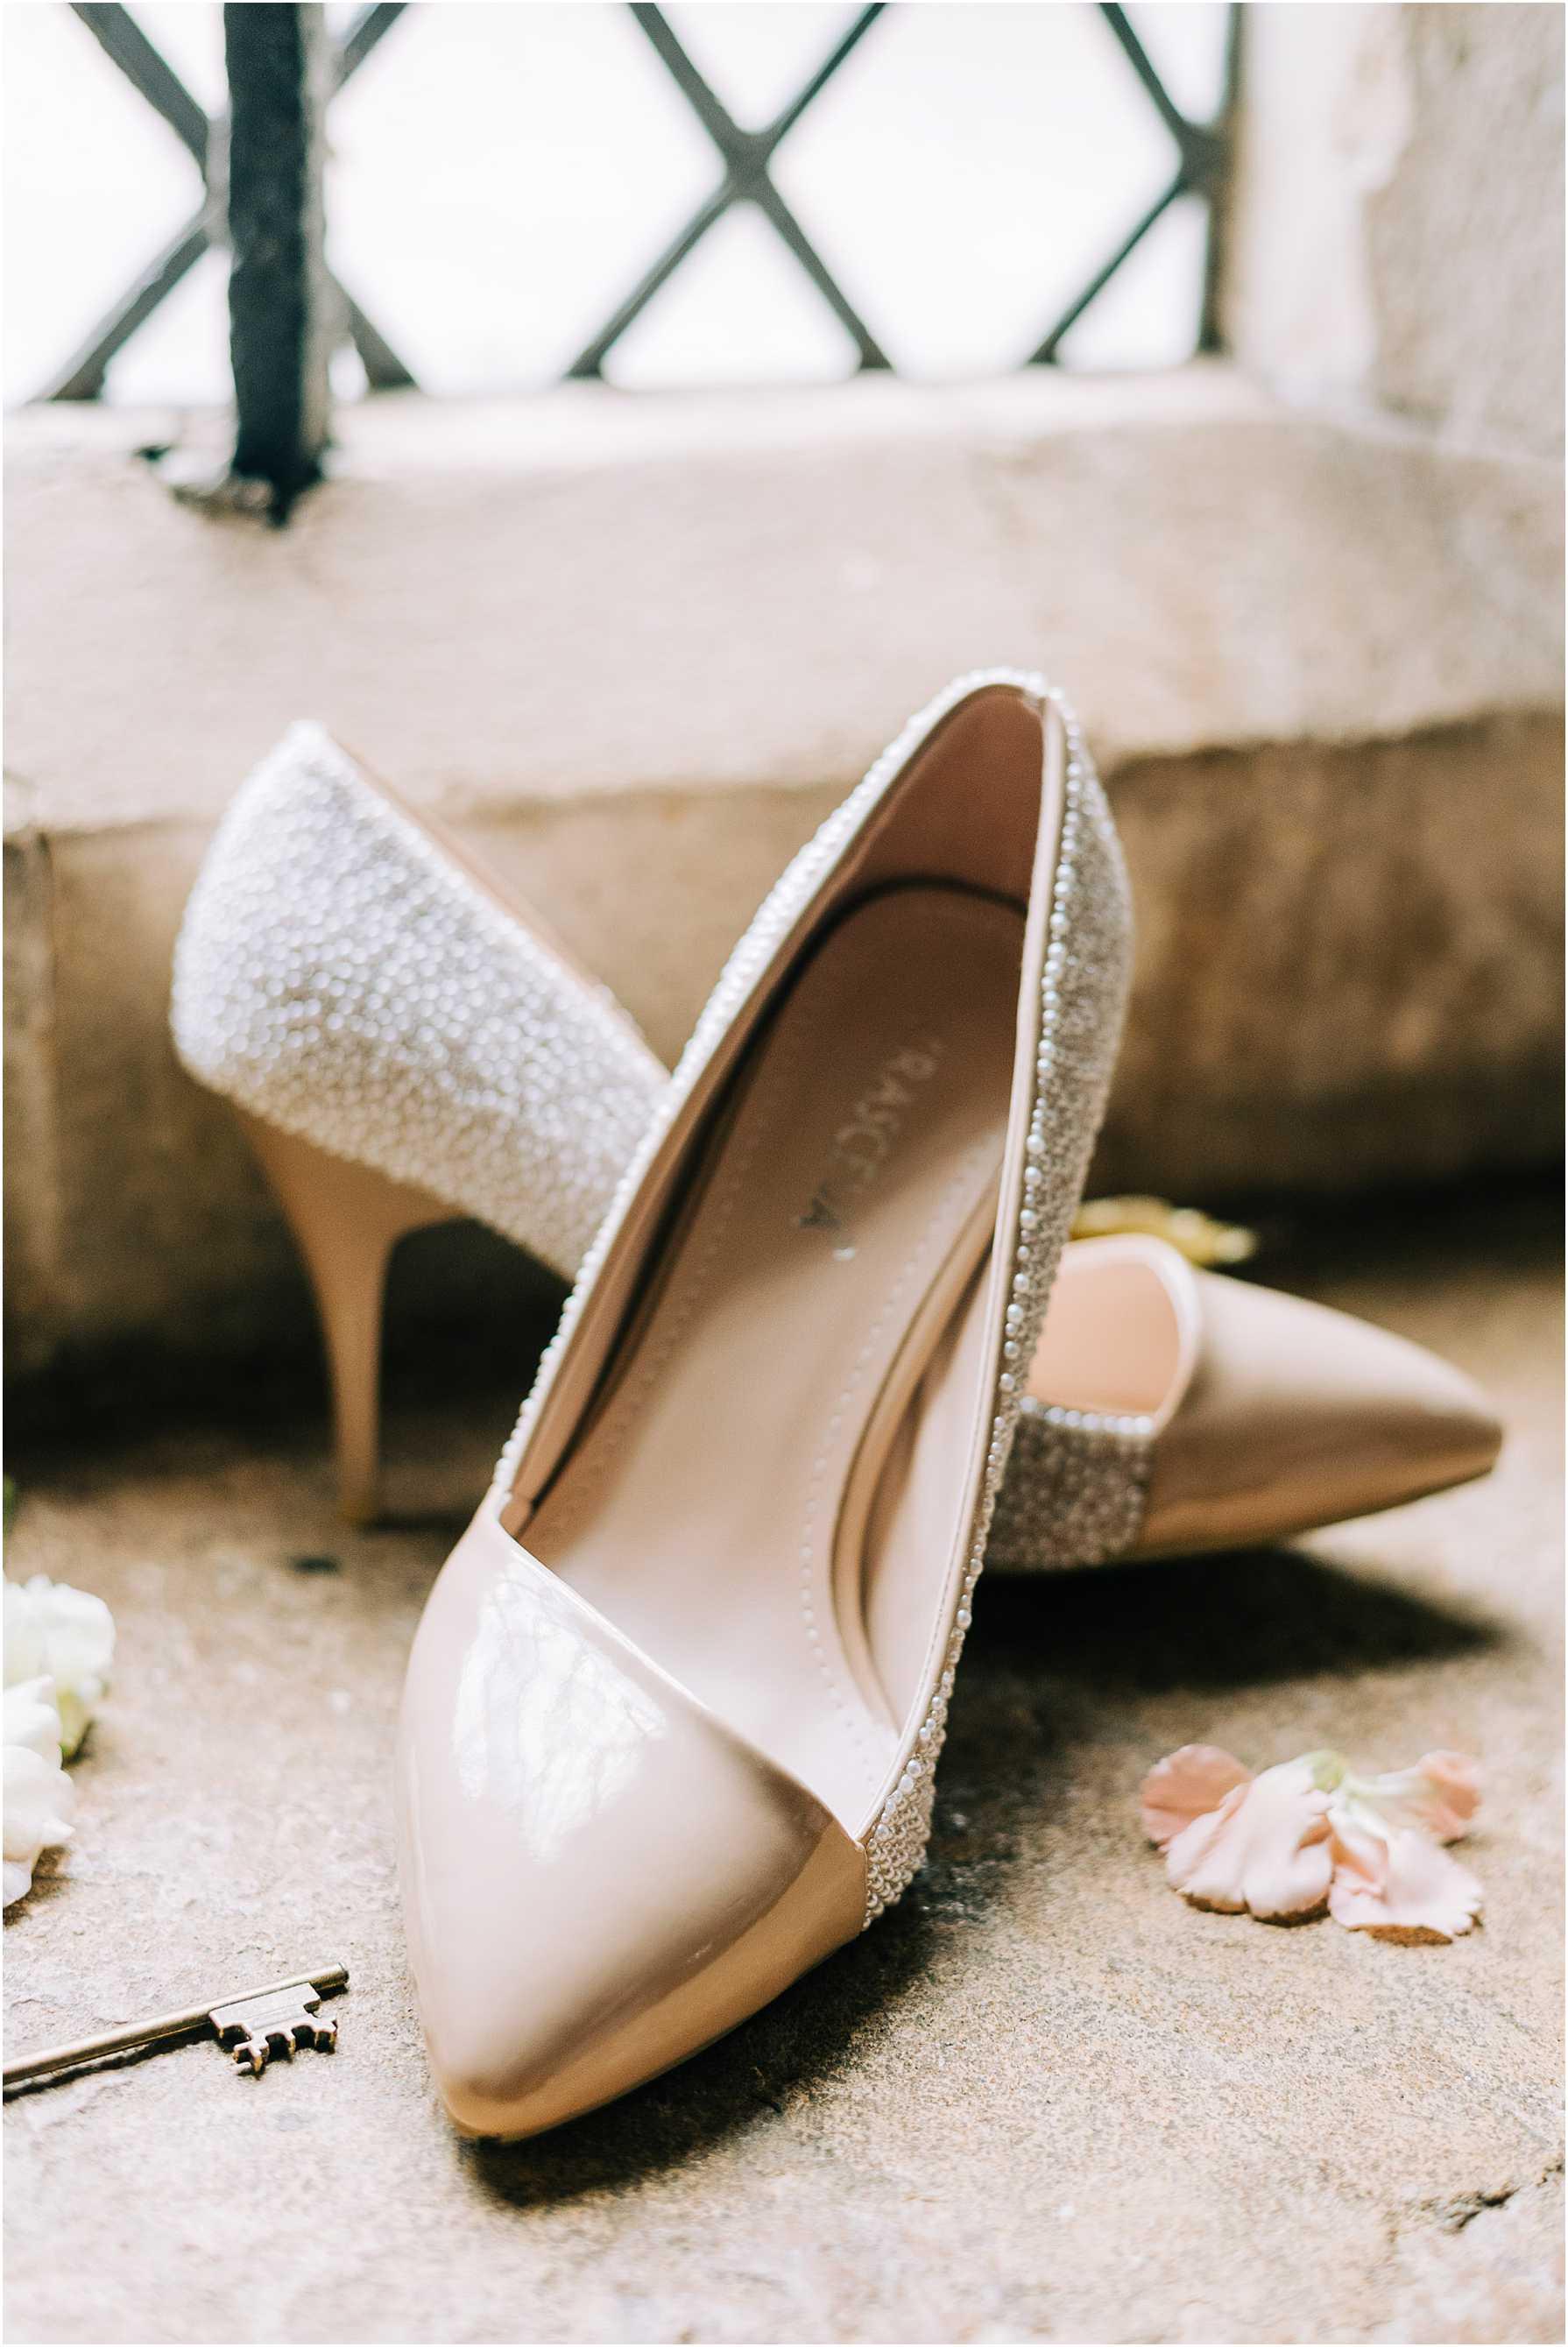 handmade diamante wedding shoes on a window sill